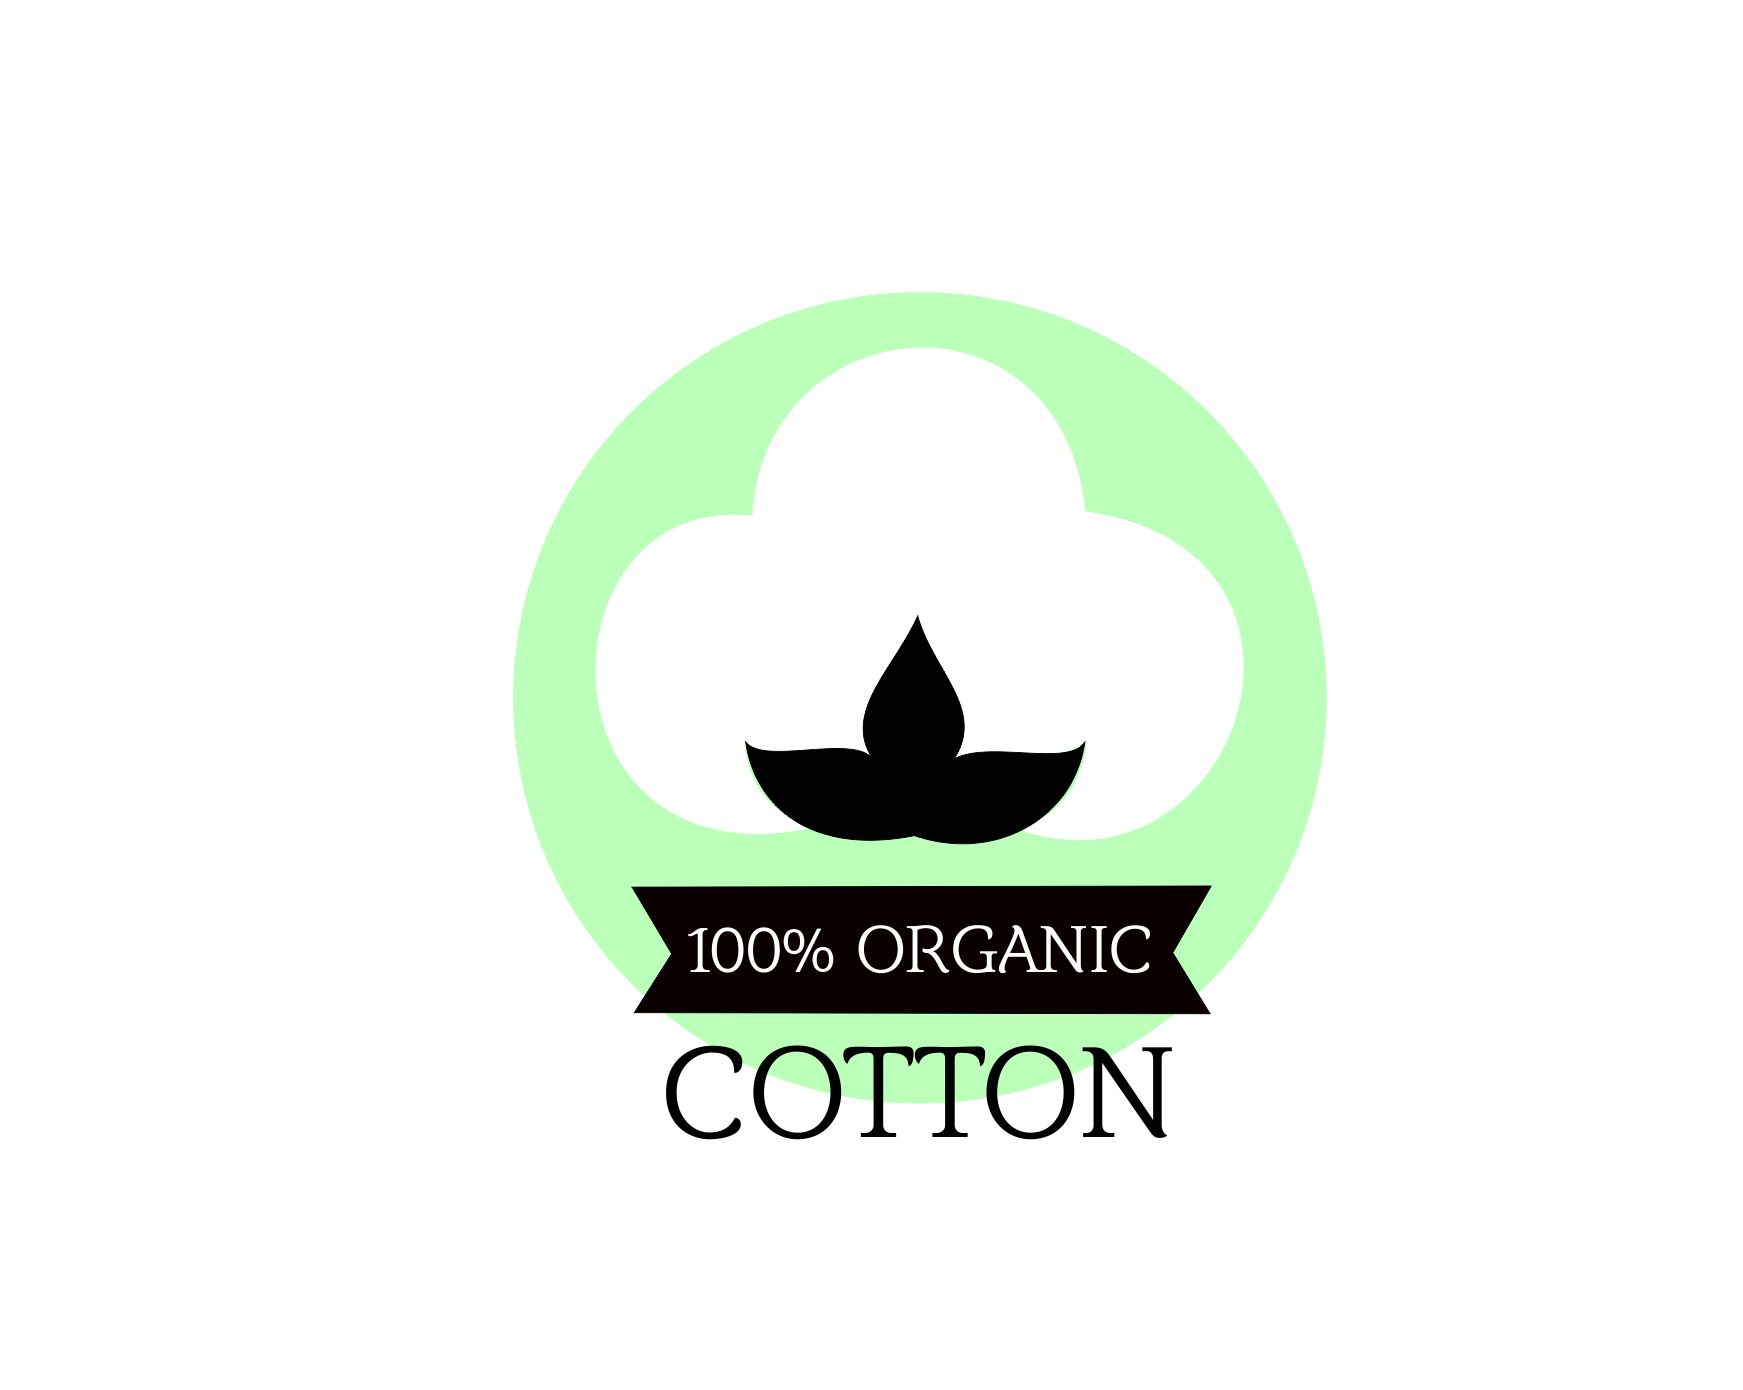 Organic1.jpg